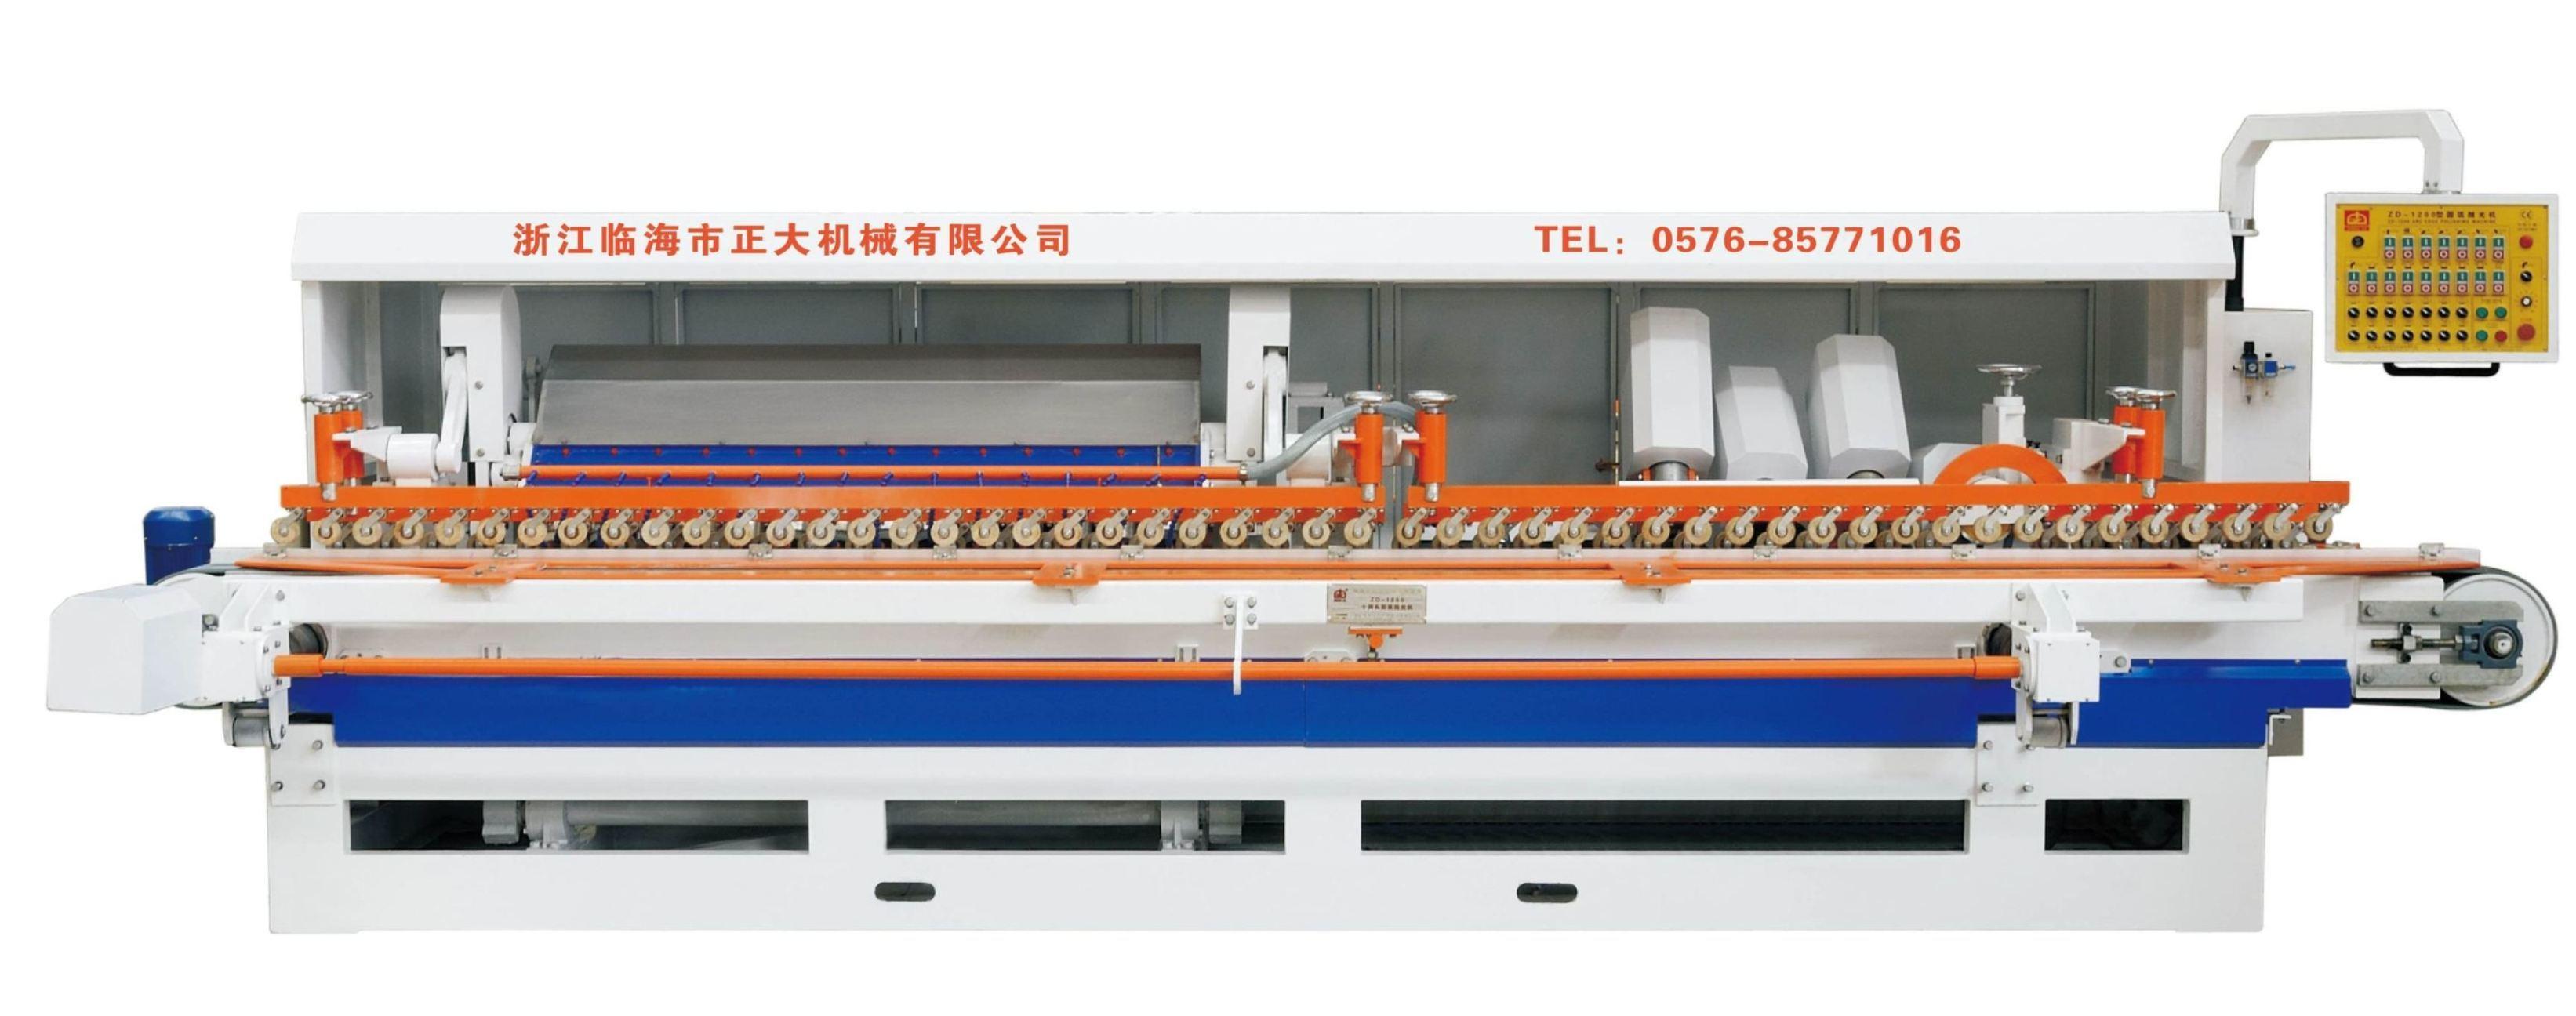 China Ceramic Tiles Edge Processing Polishing Machine With Automatic